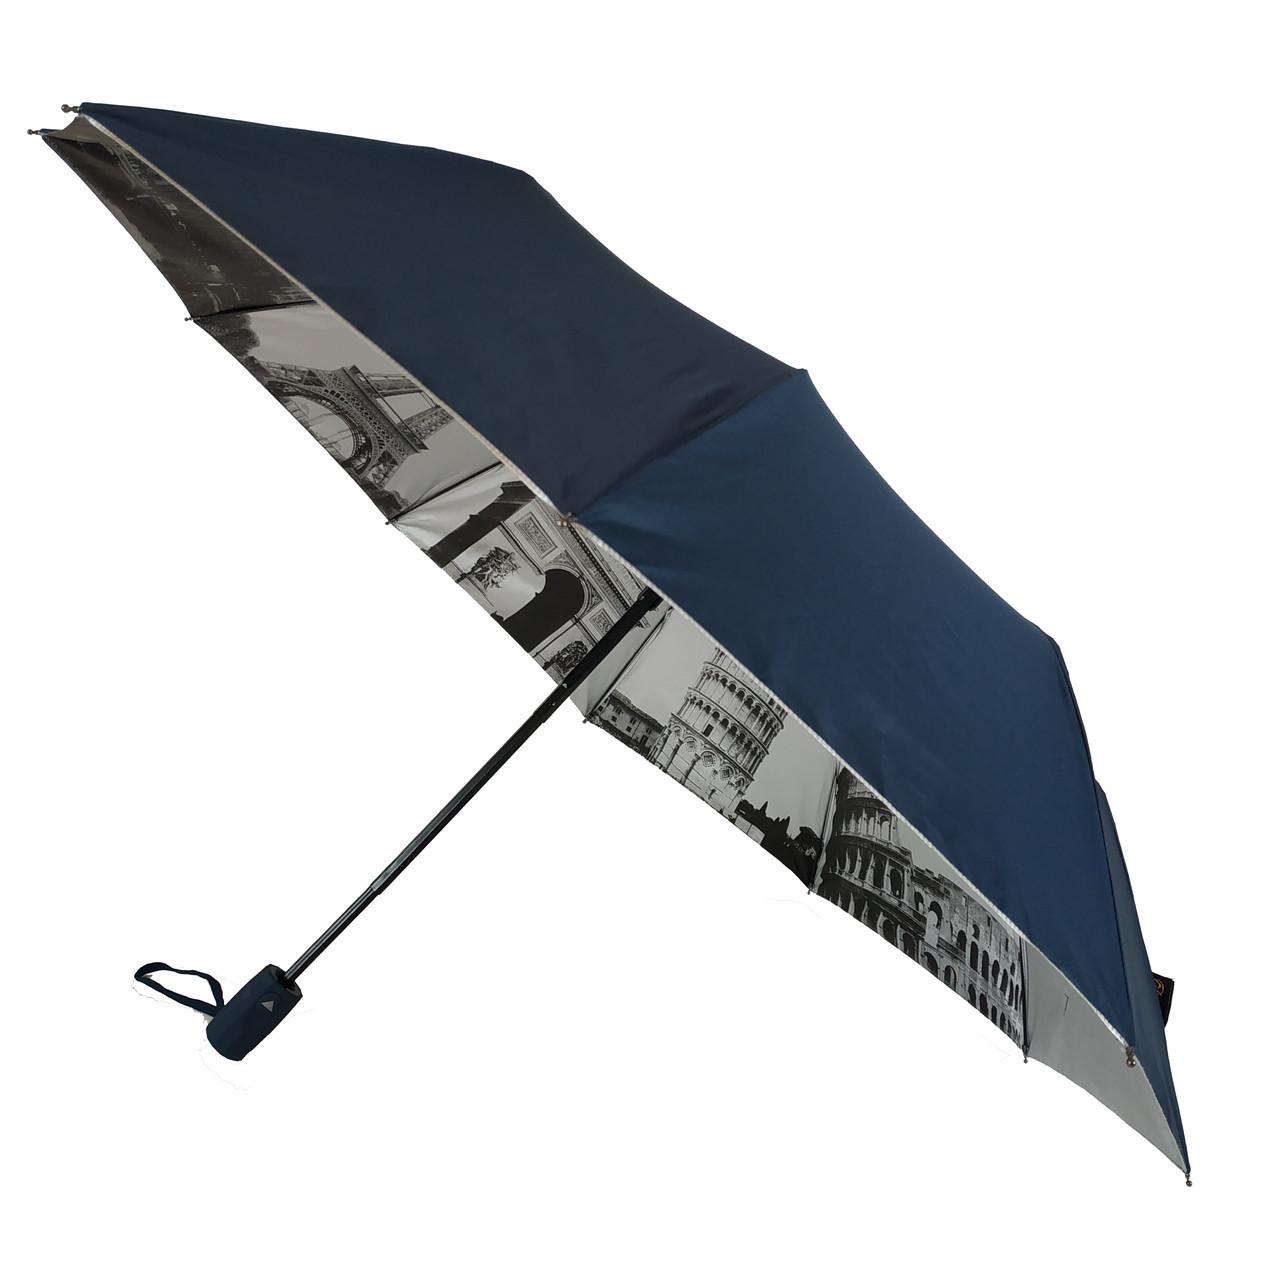 Зонтик полуавтомат Bellissimo Темно-синий 18315-8, КОД: 1234701